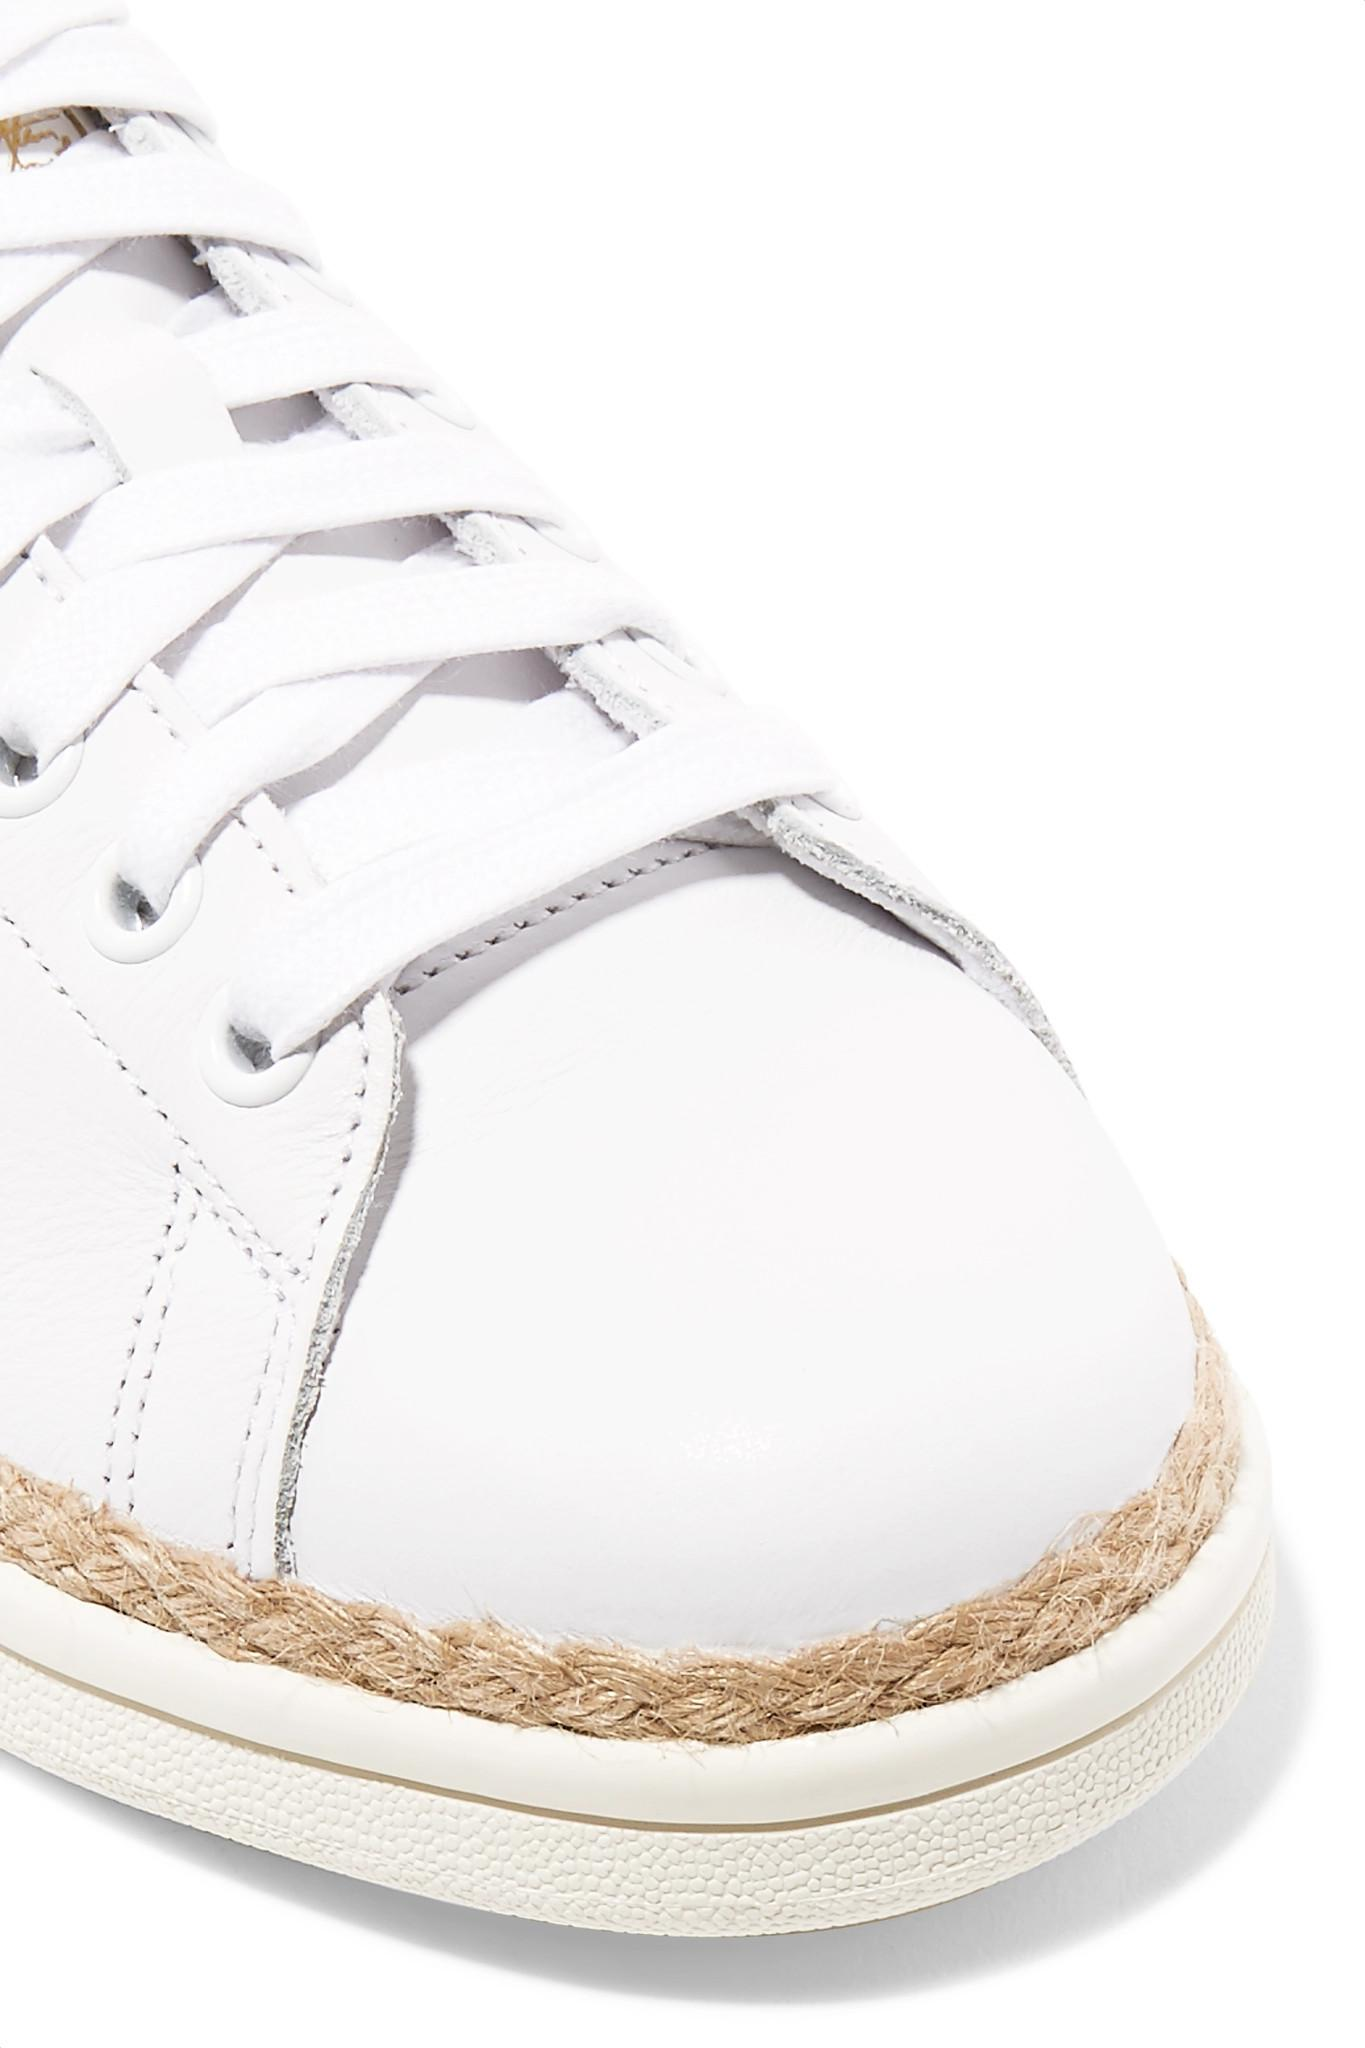 e8fa0a49632315 Adidas Originals - White Stan Smith Bold Sneakers Aus Leder Mit Seilbesatz  - Lyst. Vollbild ansehen